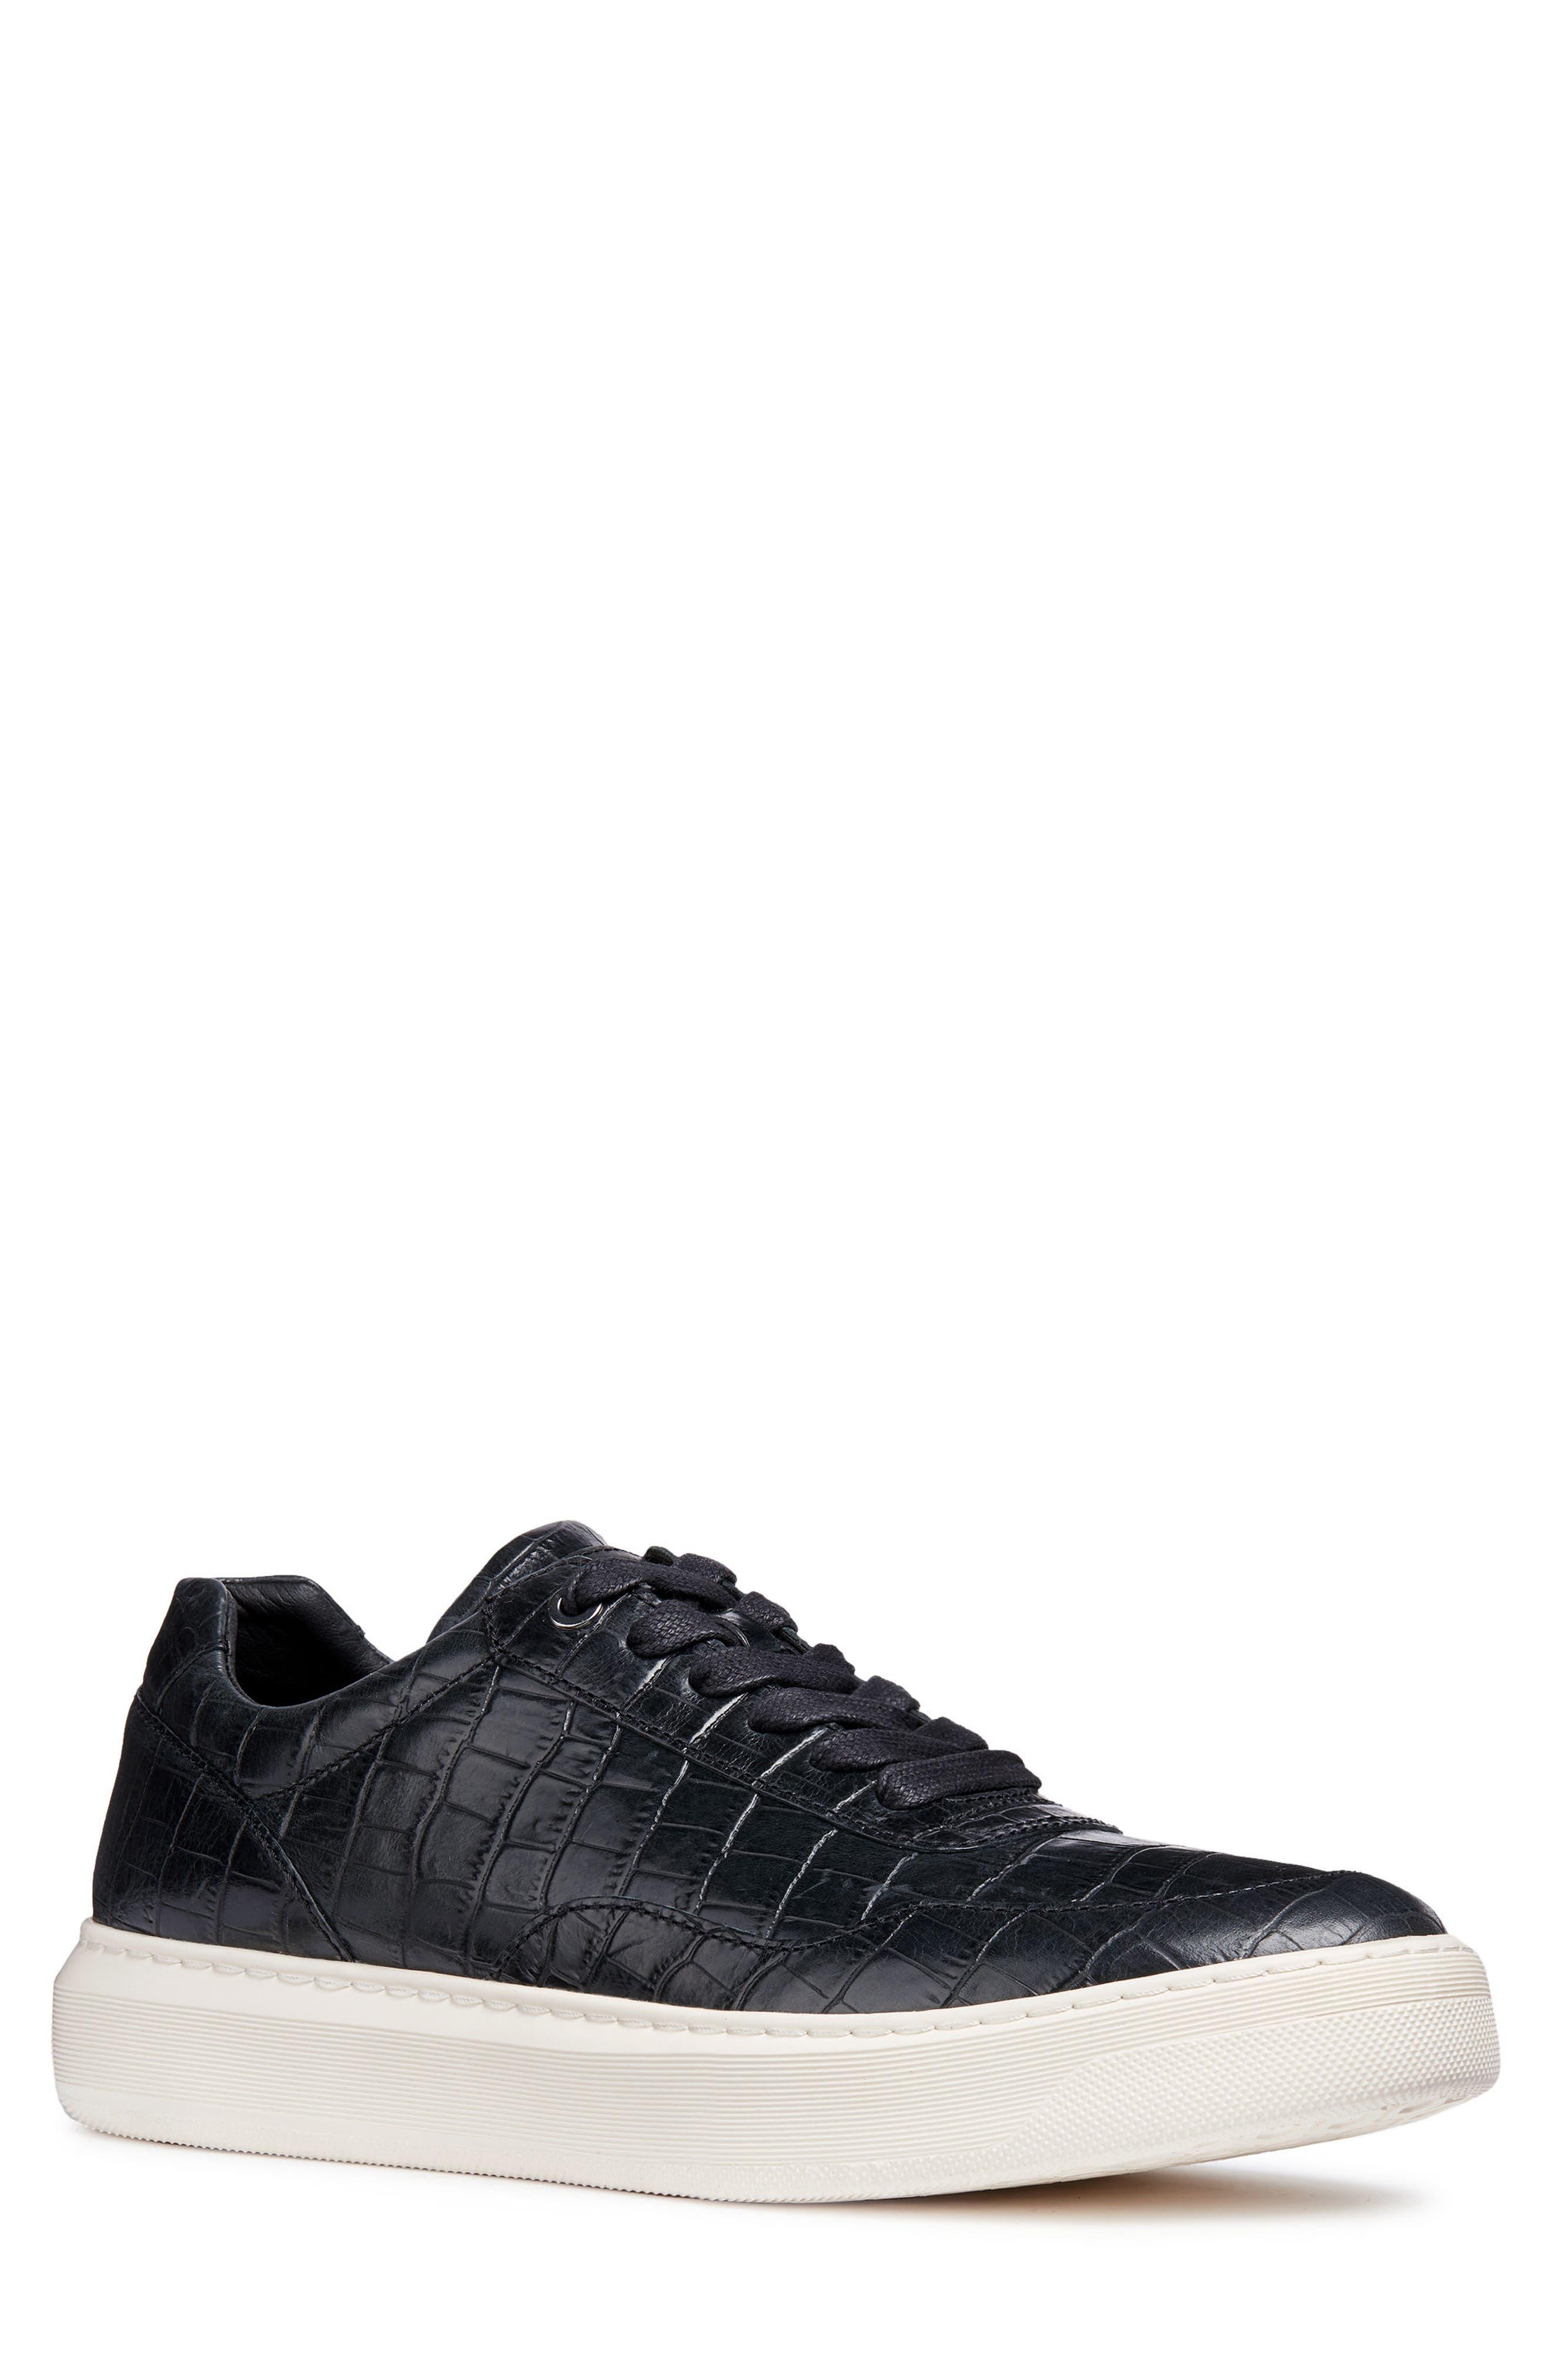 Deiven 8 Croc Textured Low Top Sneaker,                         Main,                         color, BLACK LEATHER